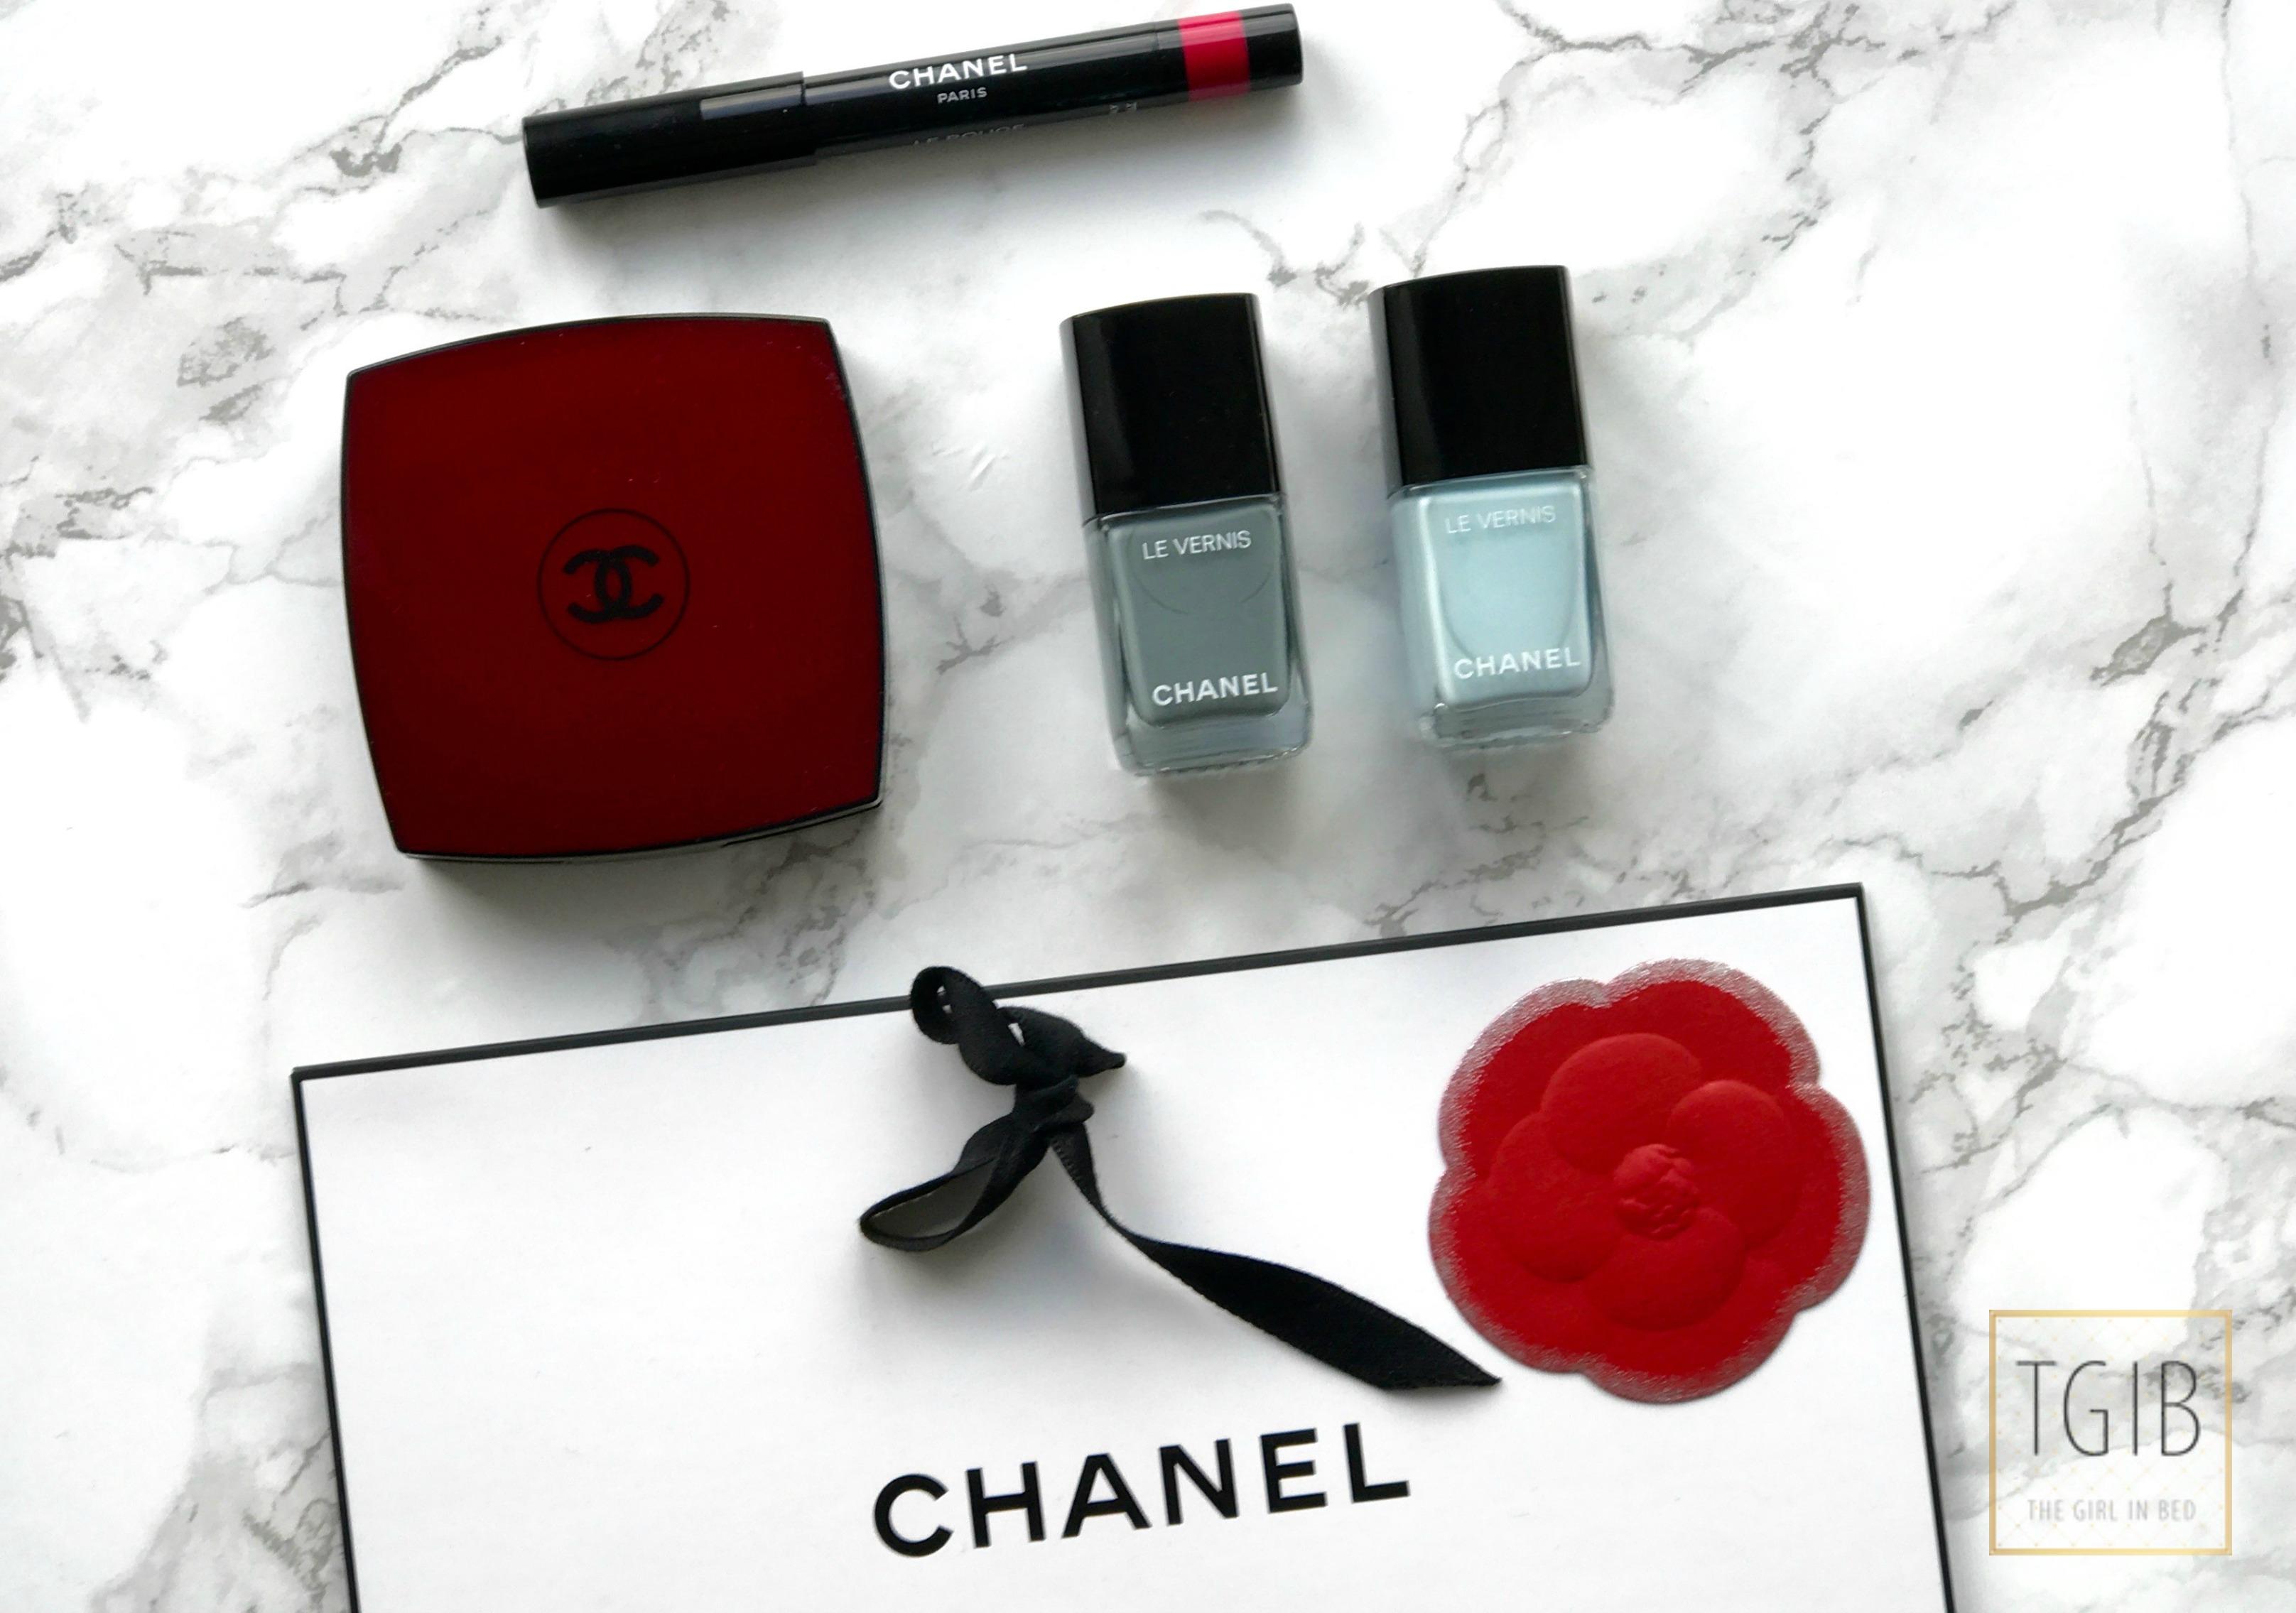 Chanel Beauty Shoplog